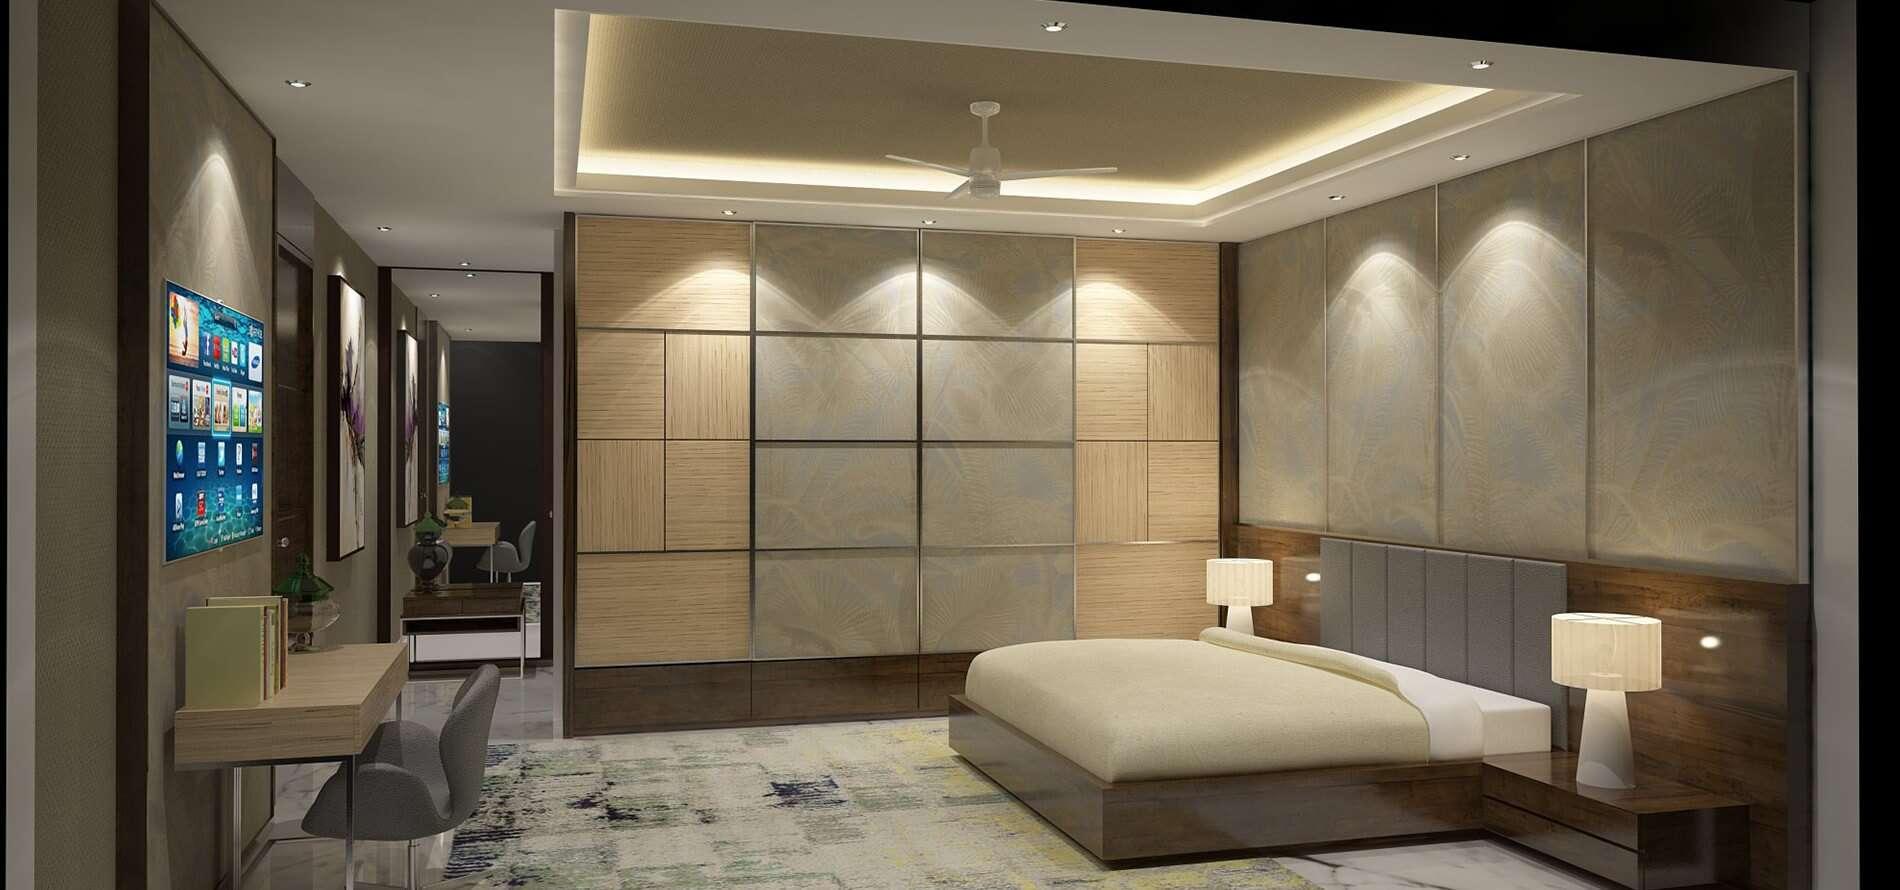 Shaffi SKS Interiors